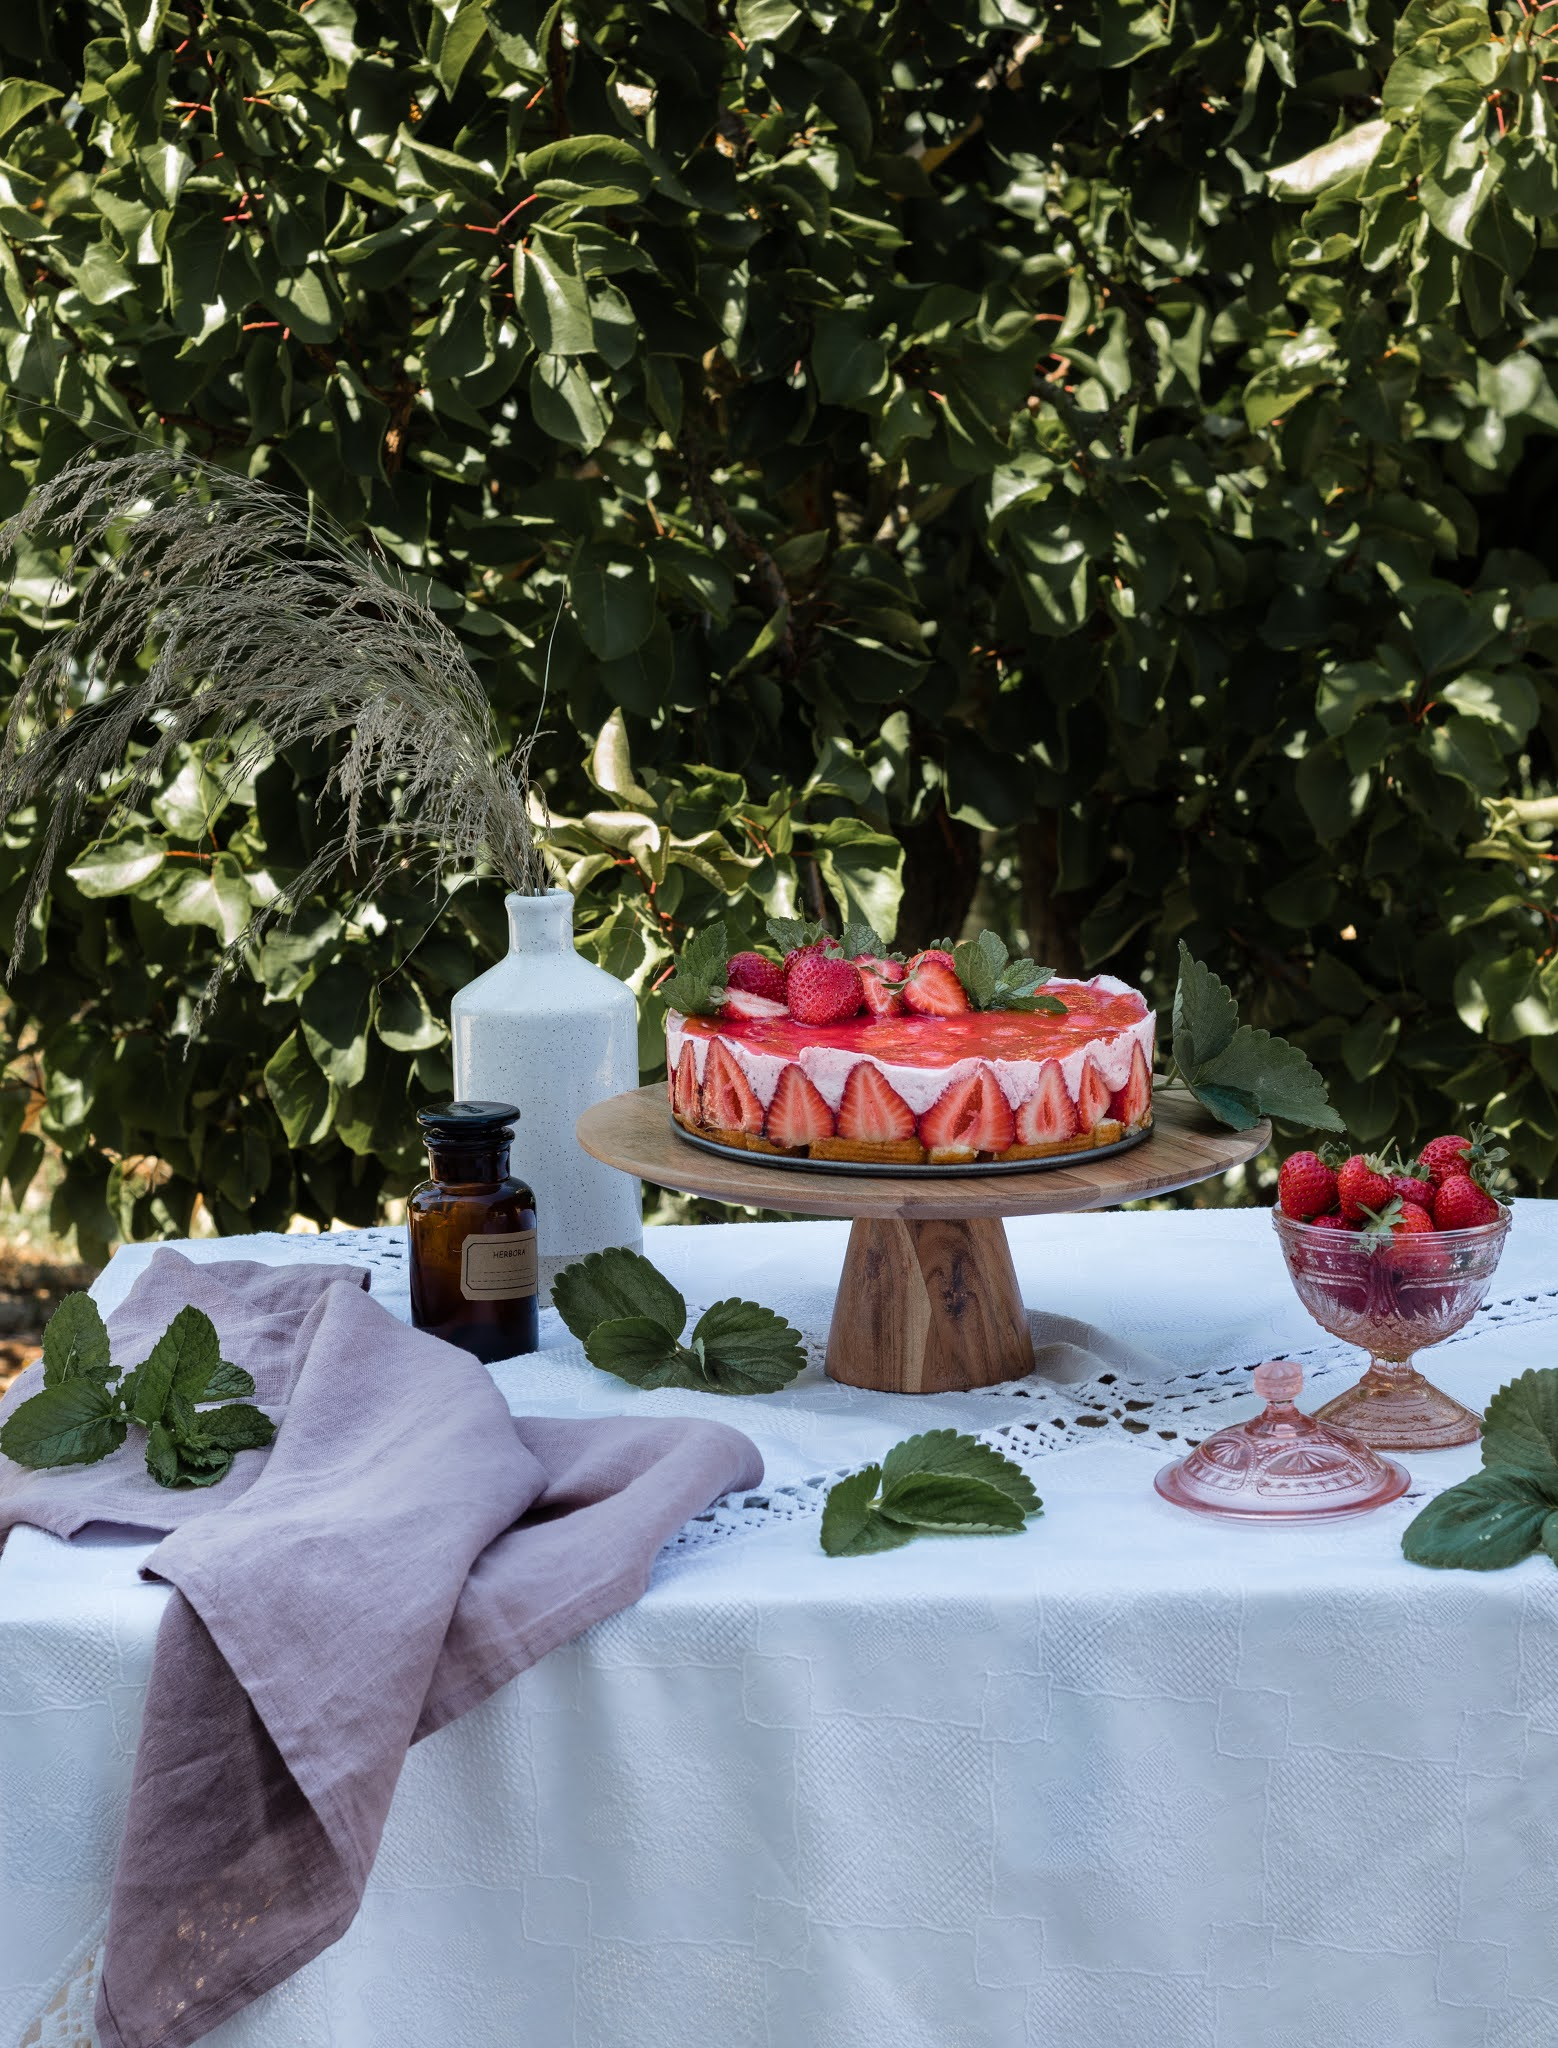 receita simples de semifrio de morango